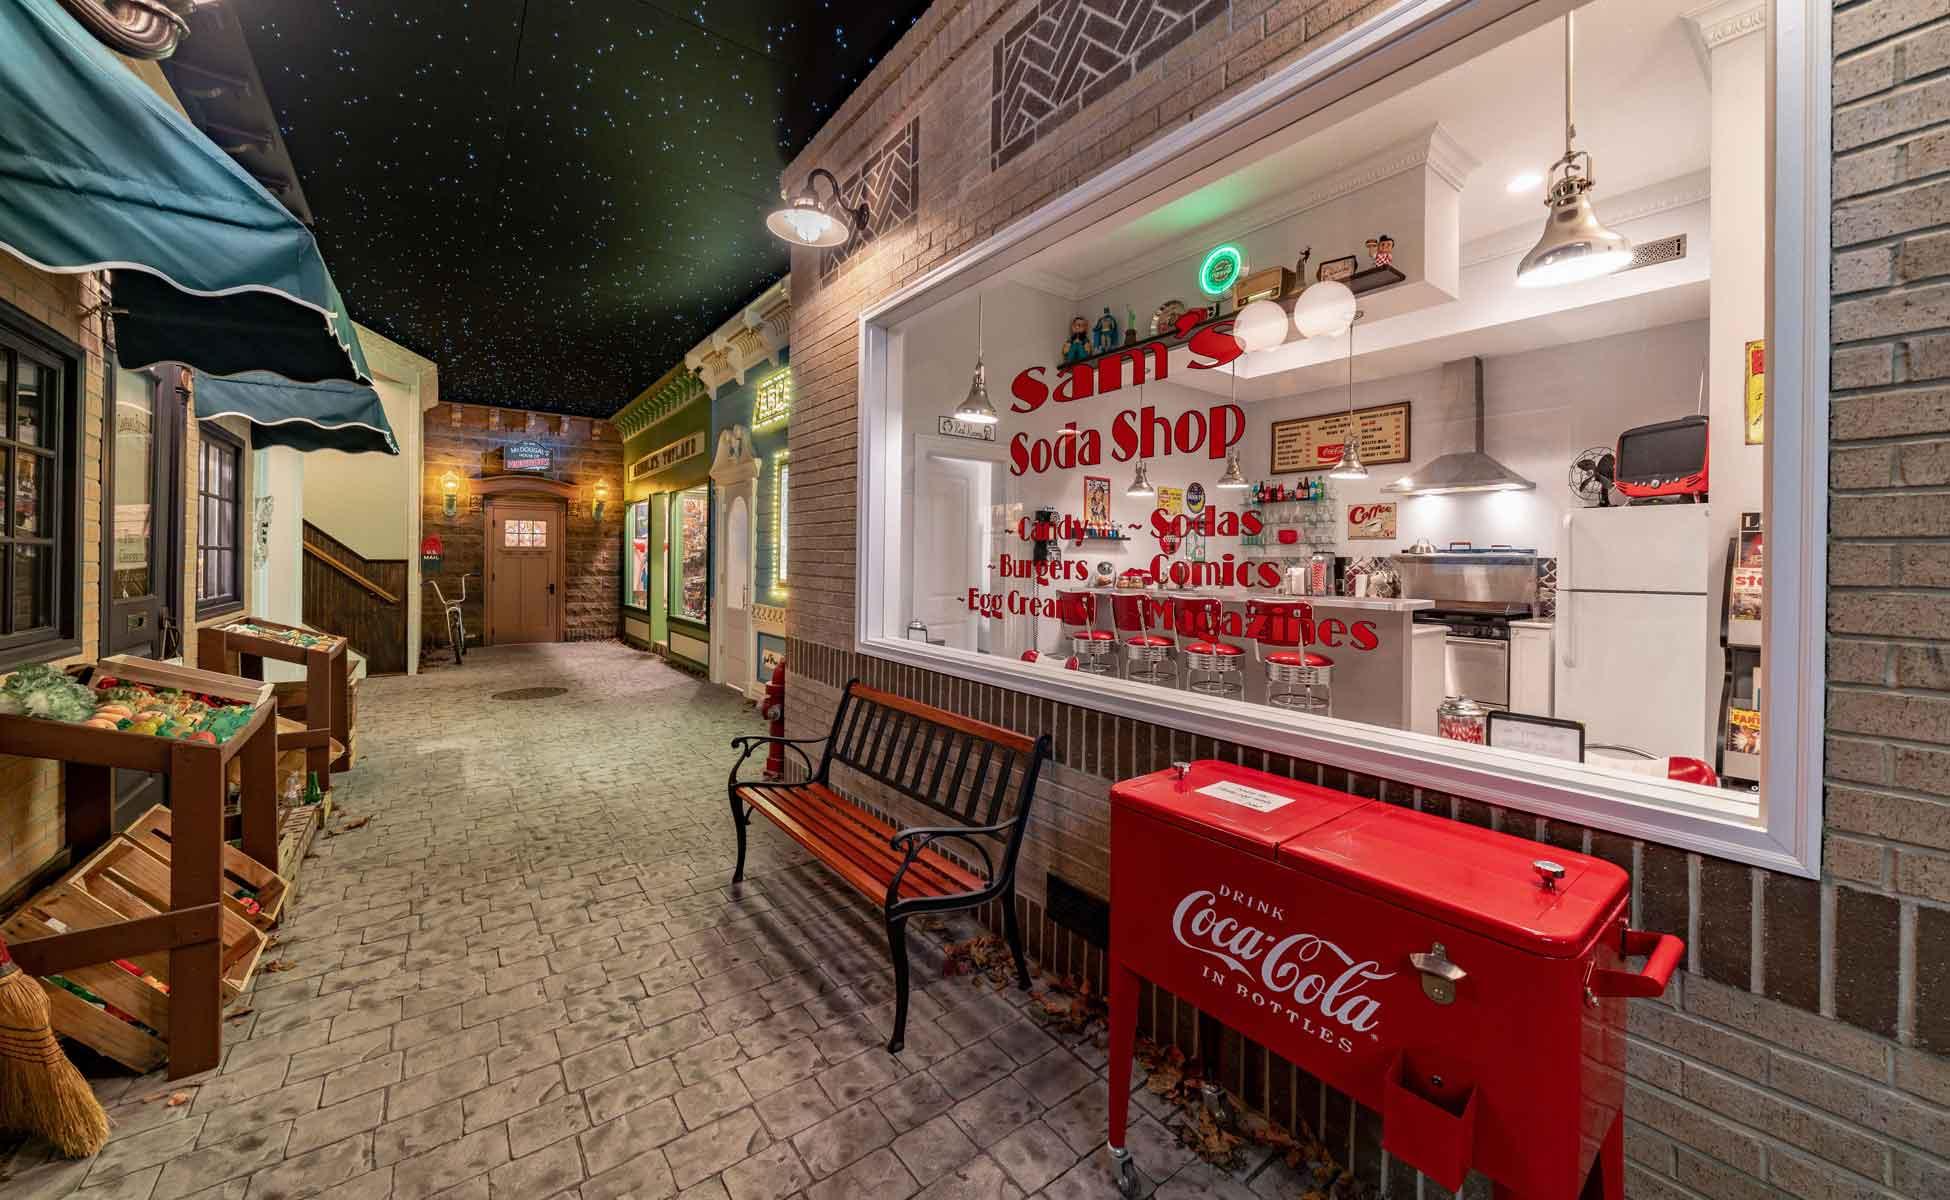 Dream-Visions-Interiors-Street-Town-Square-Settings-Soda-Shop-Web-LR